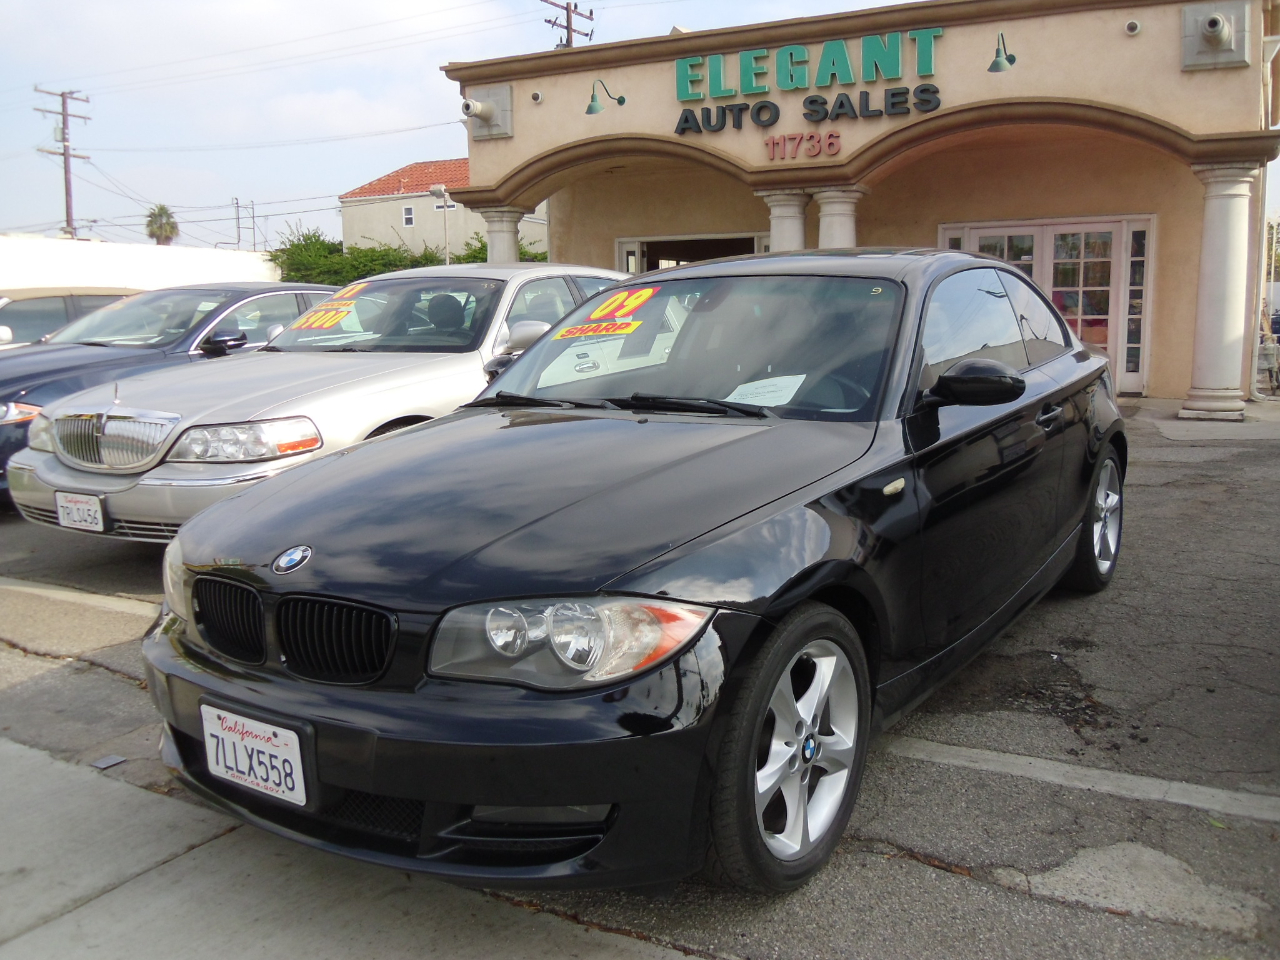 2009 BMW 1 Series 2dr Cpe 128i SULEV